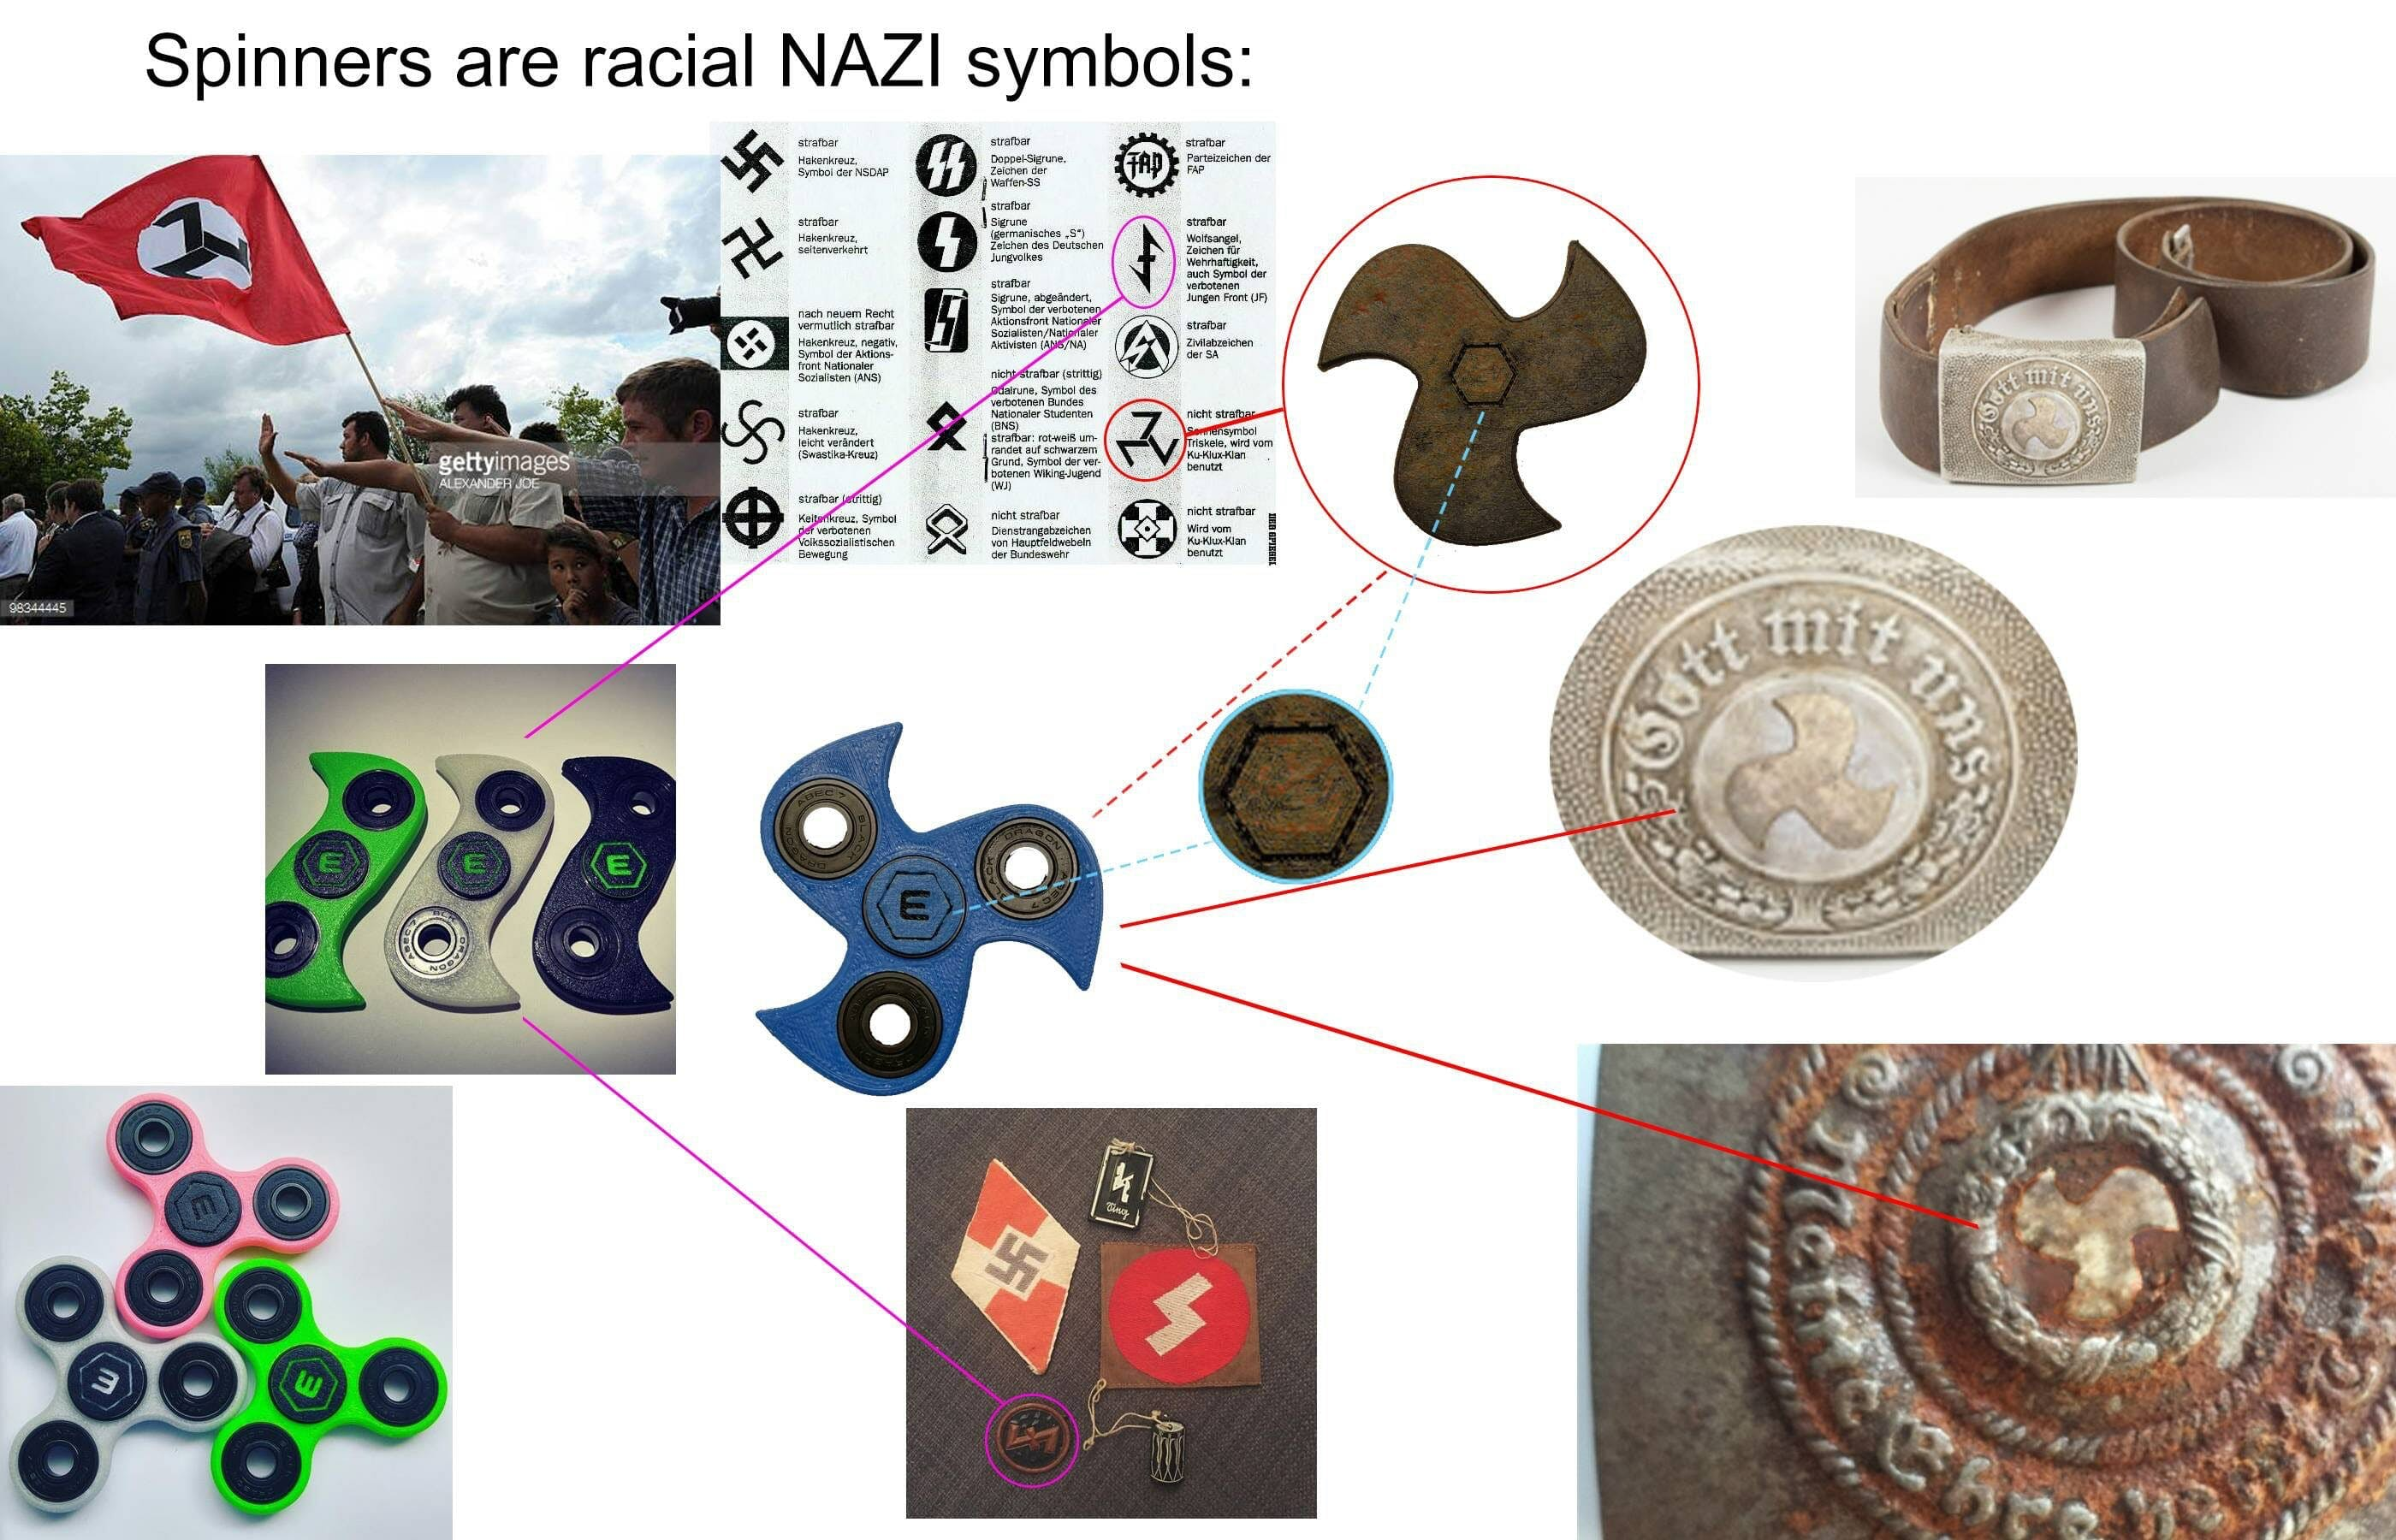 fidget spinner swastika memes